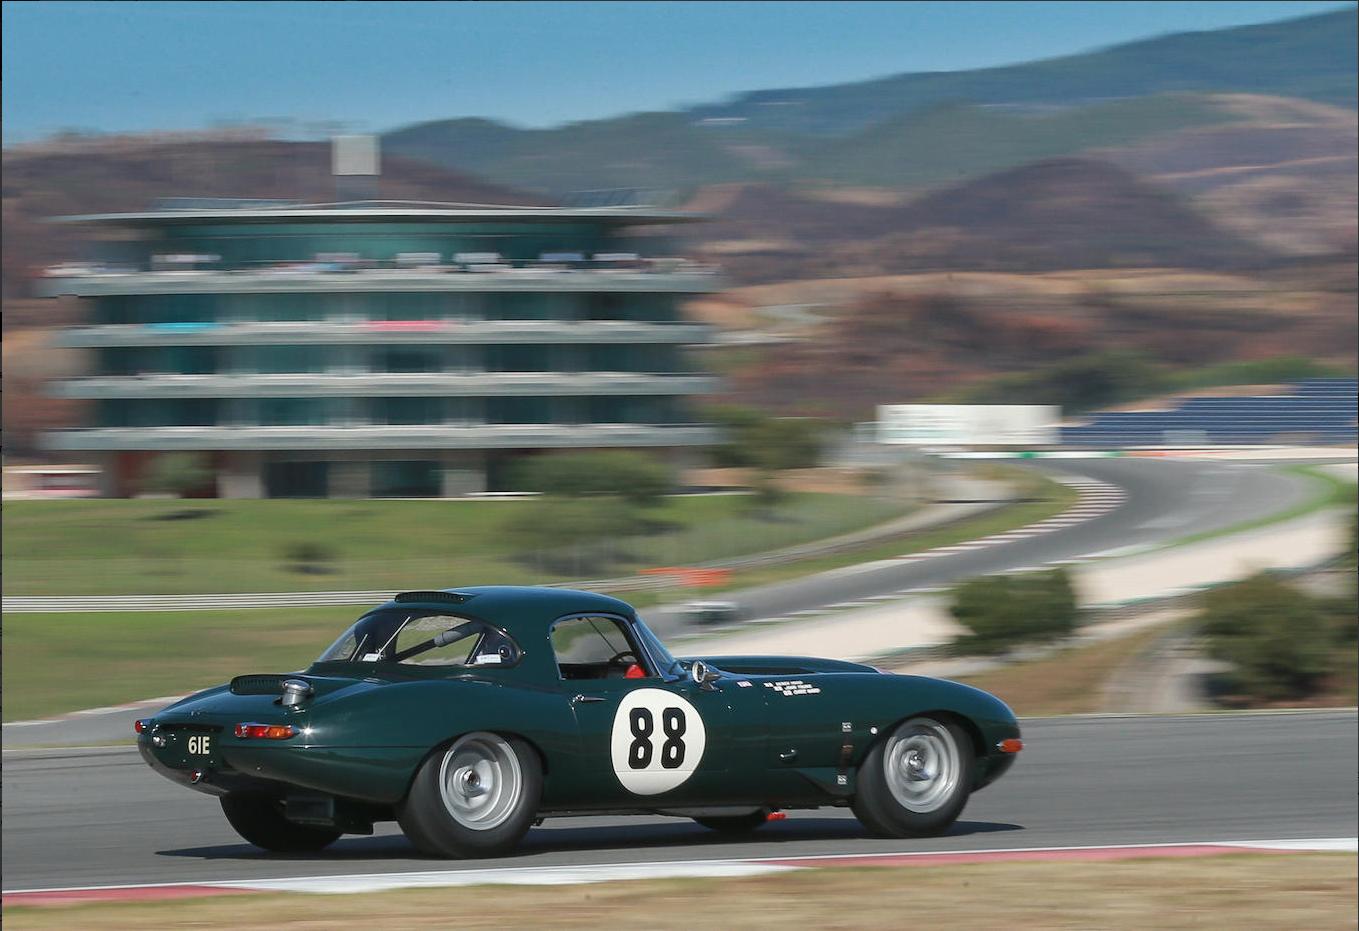 1961 Jaguar E-Type Series 1 3.8 Lightweight Race Car For Sale (picture 6 of 6)